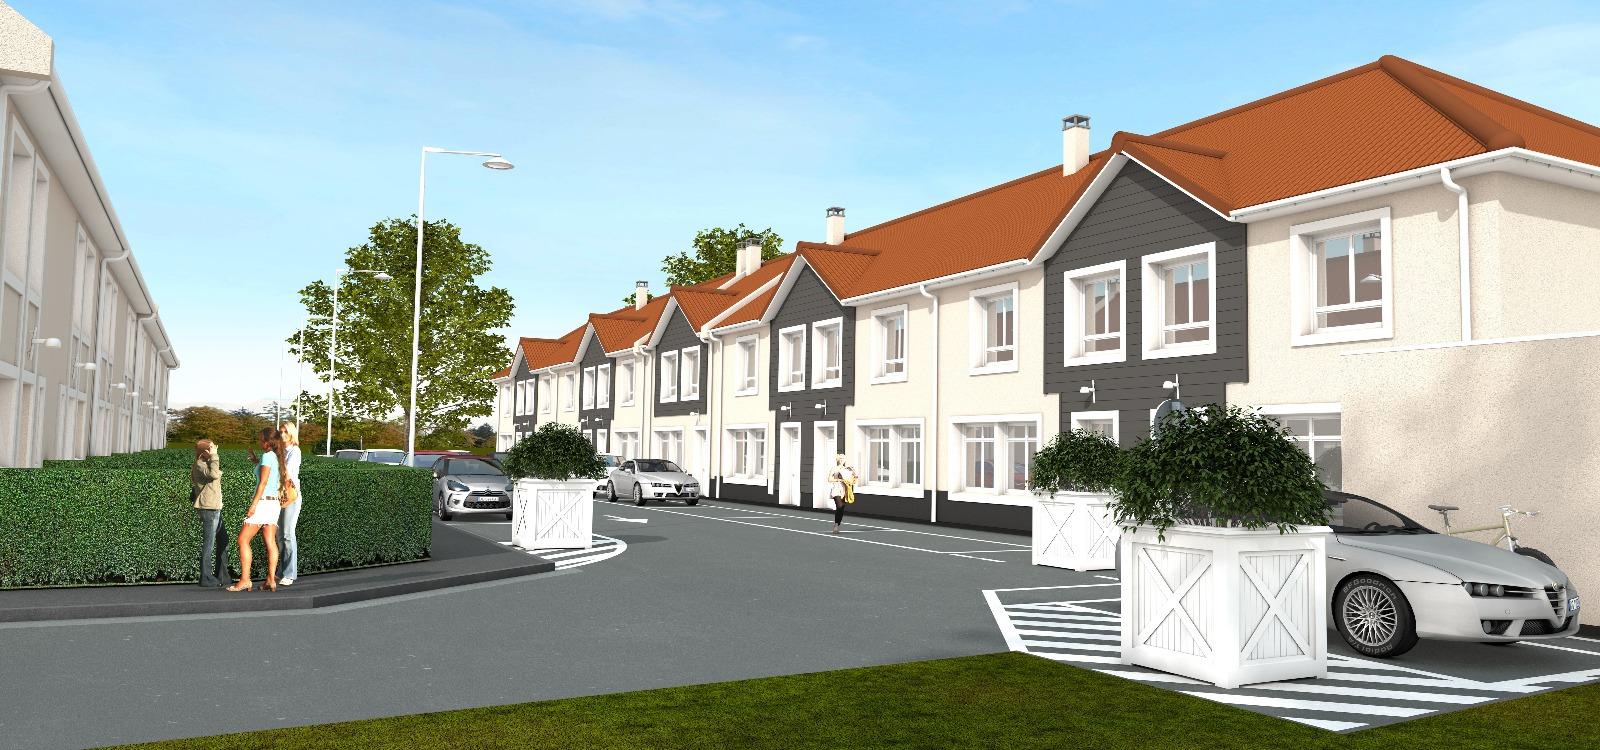 Programme neuf maison 90m2 3 chambres jardin immobili re for Jardin 90m2